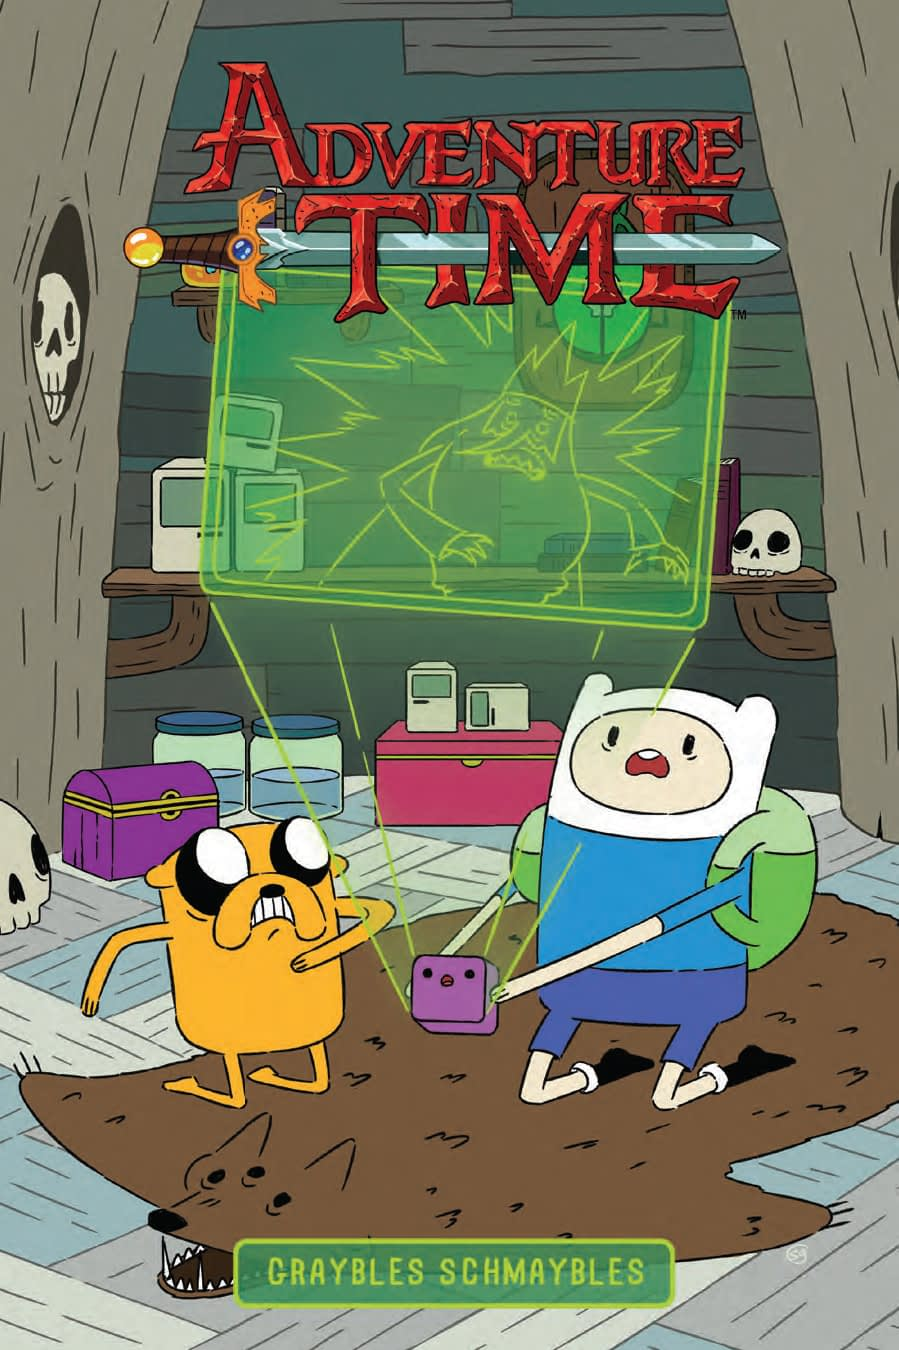 Adventure Time Princess Day adventure time vol. 5: graybles schmaybles arrives april 1st